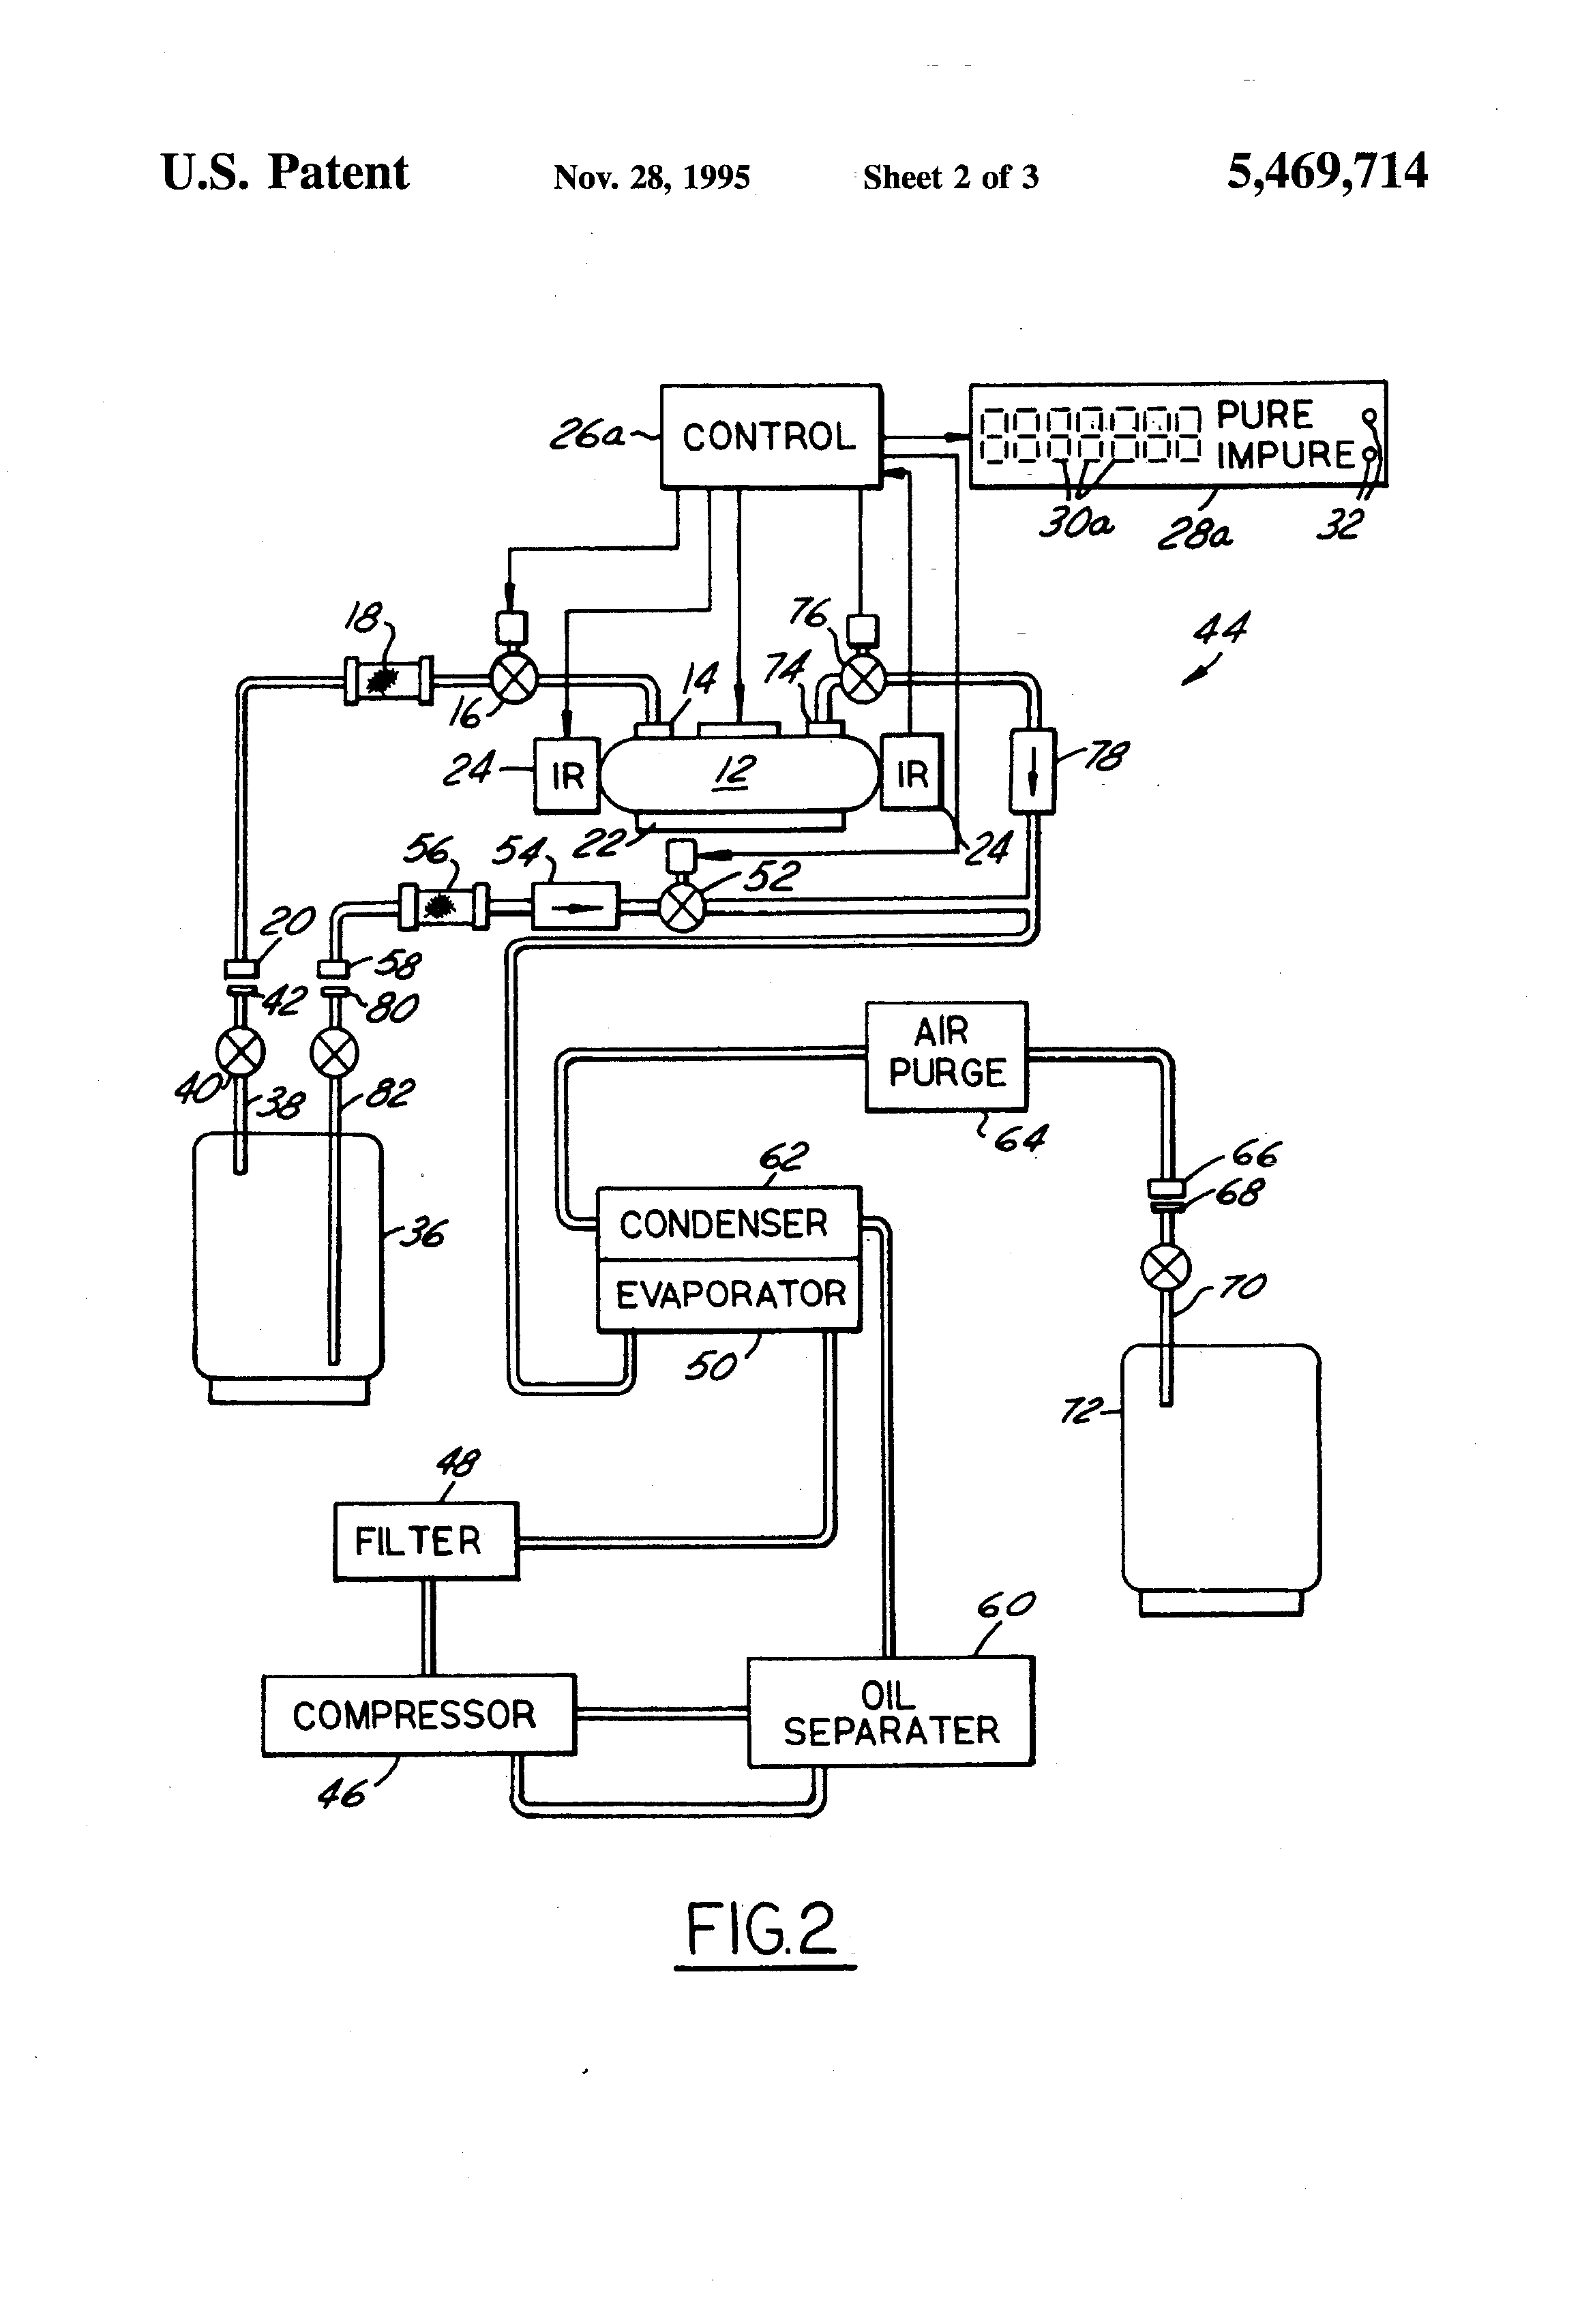 and apparatus for analyzing refrigerant properties   Patents #3E3E3E